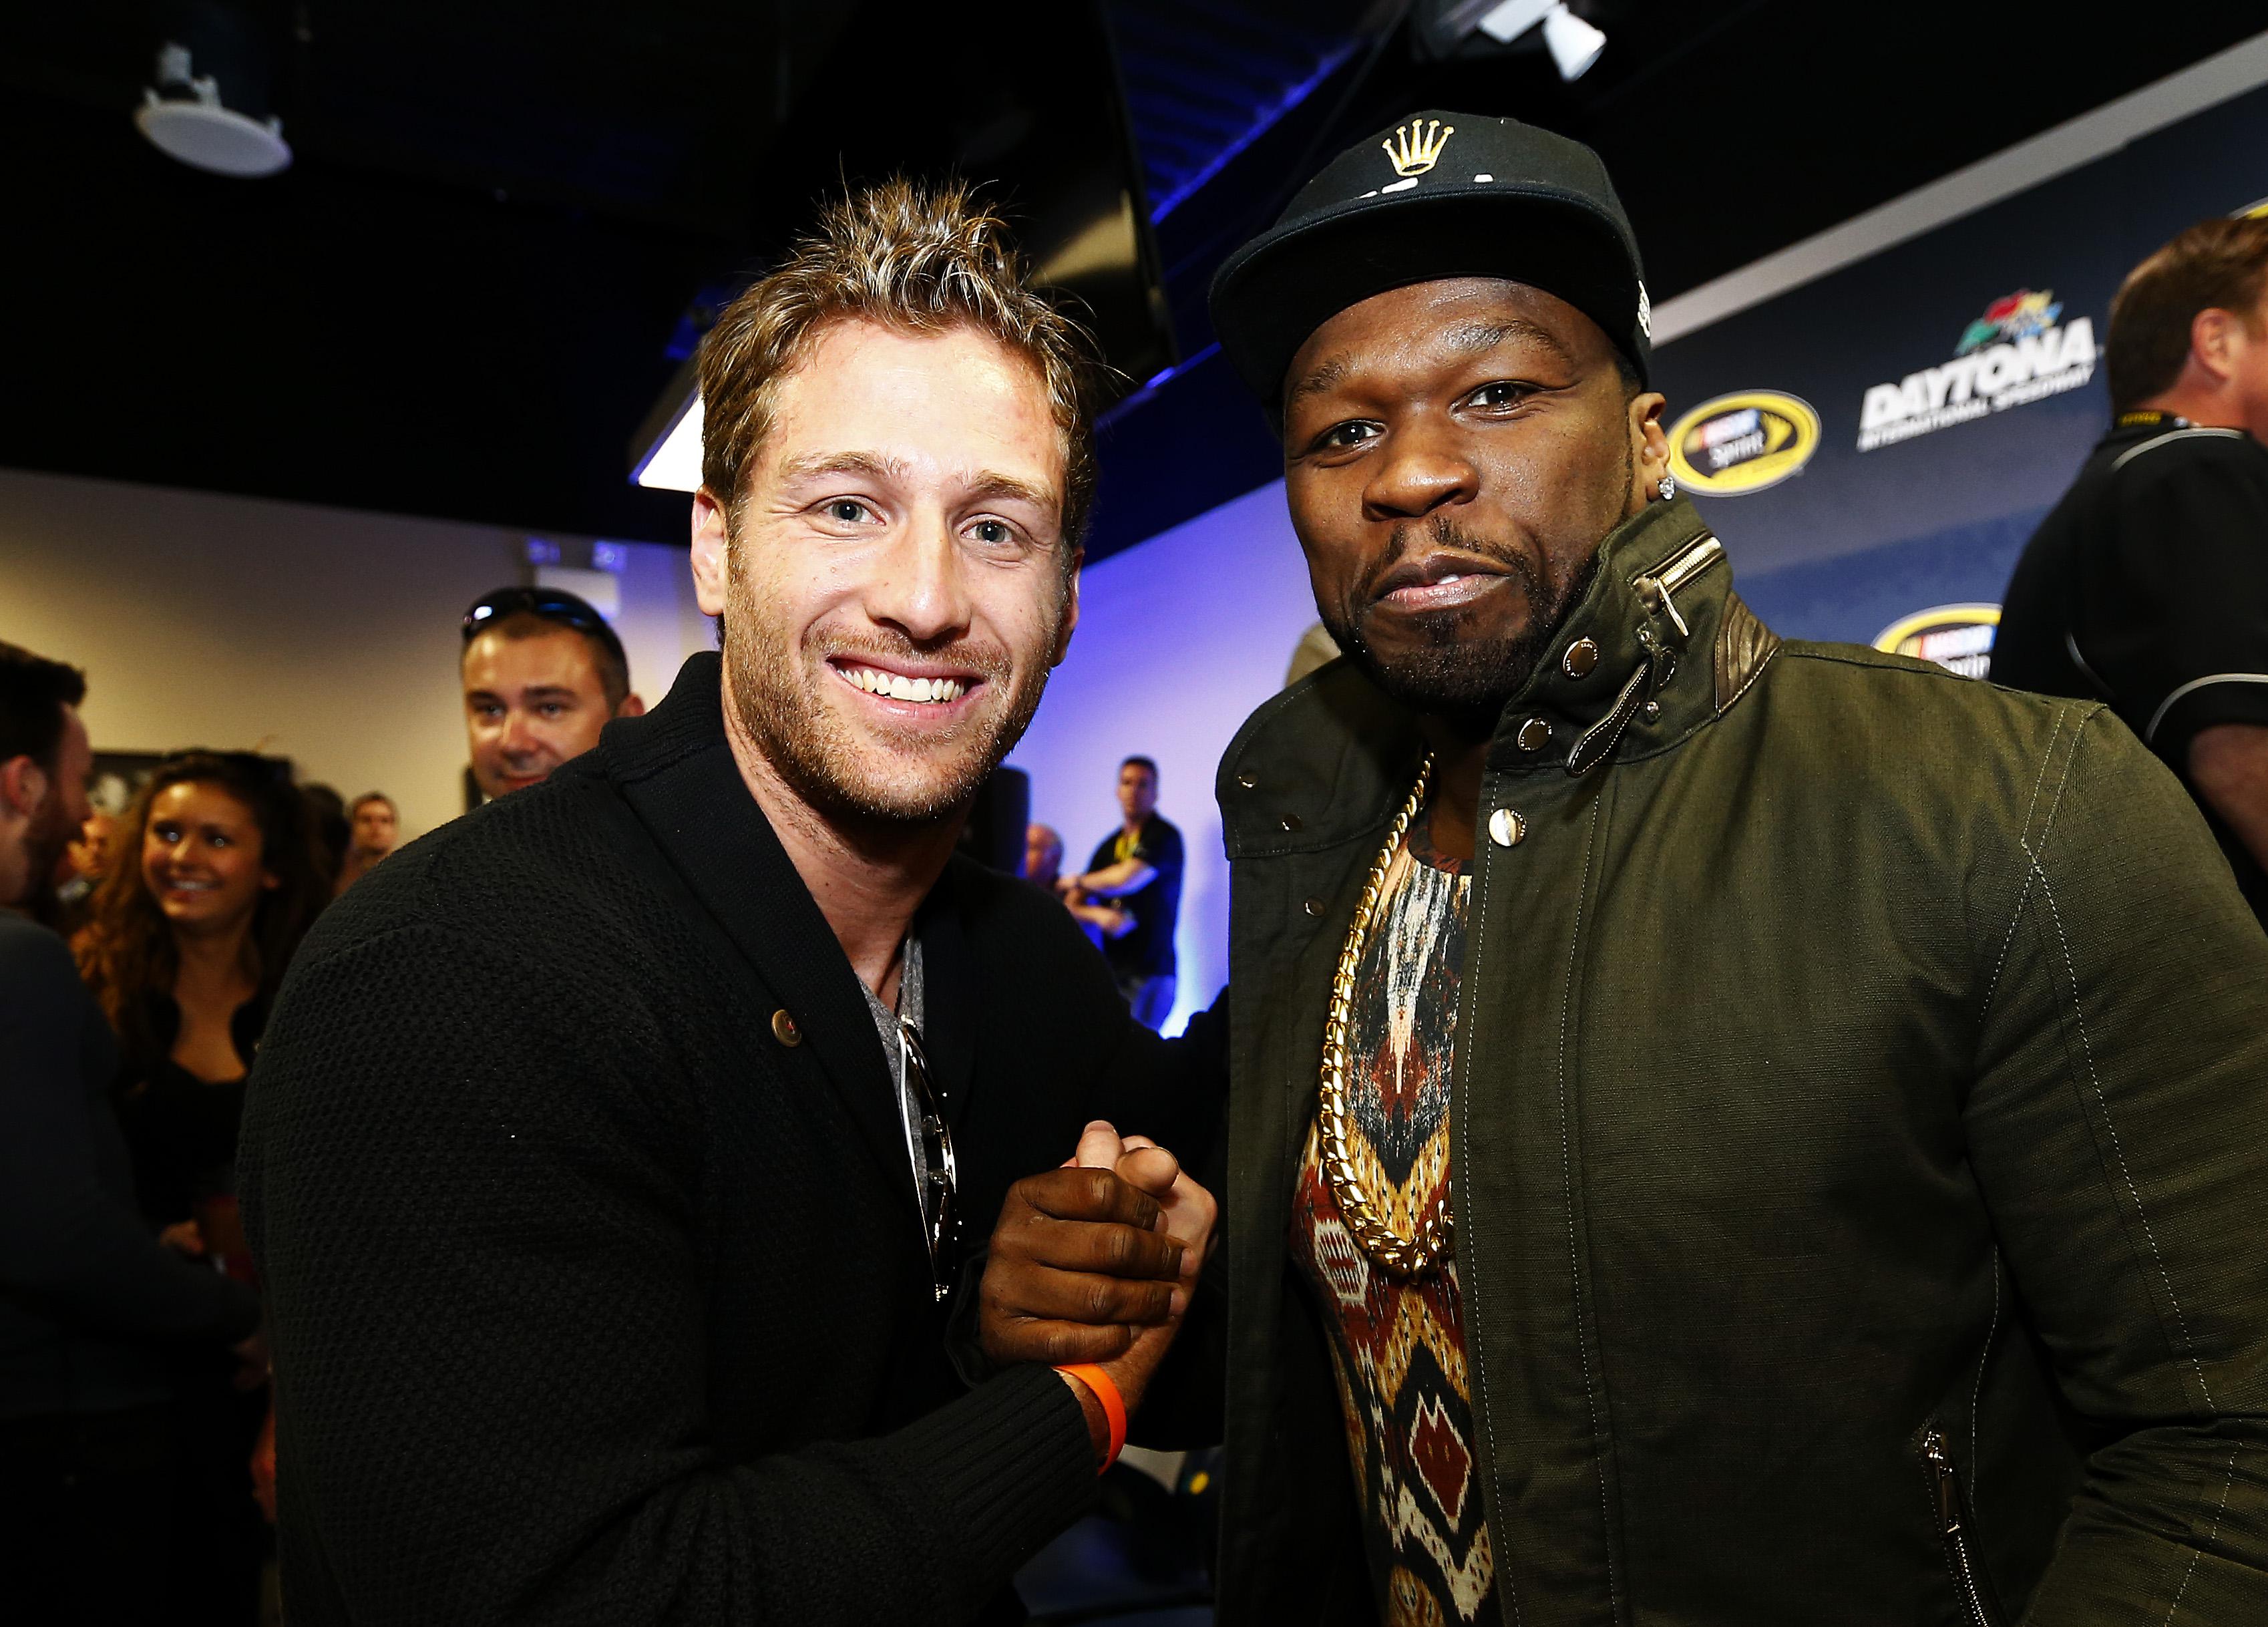 Juan Pablo Galavis & 50 Cent